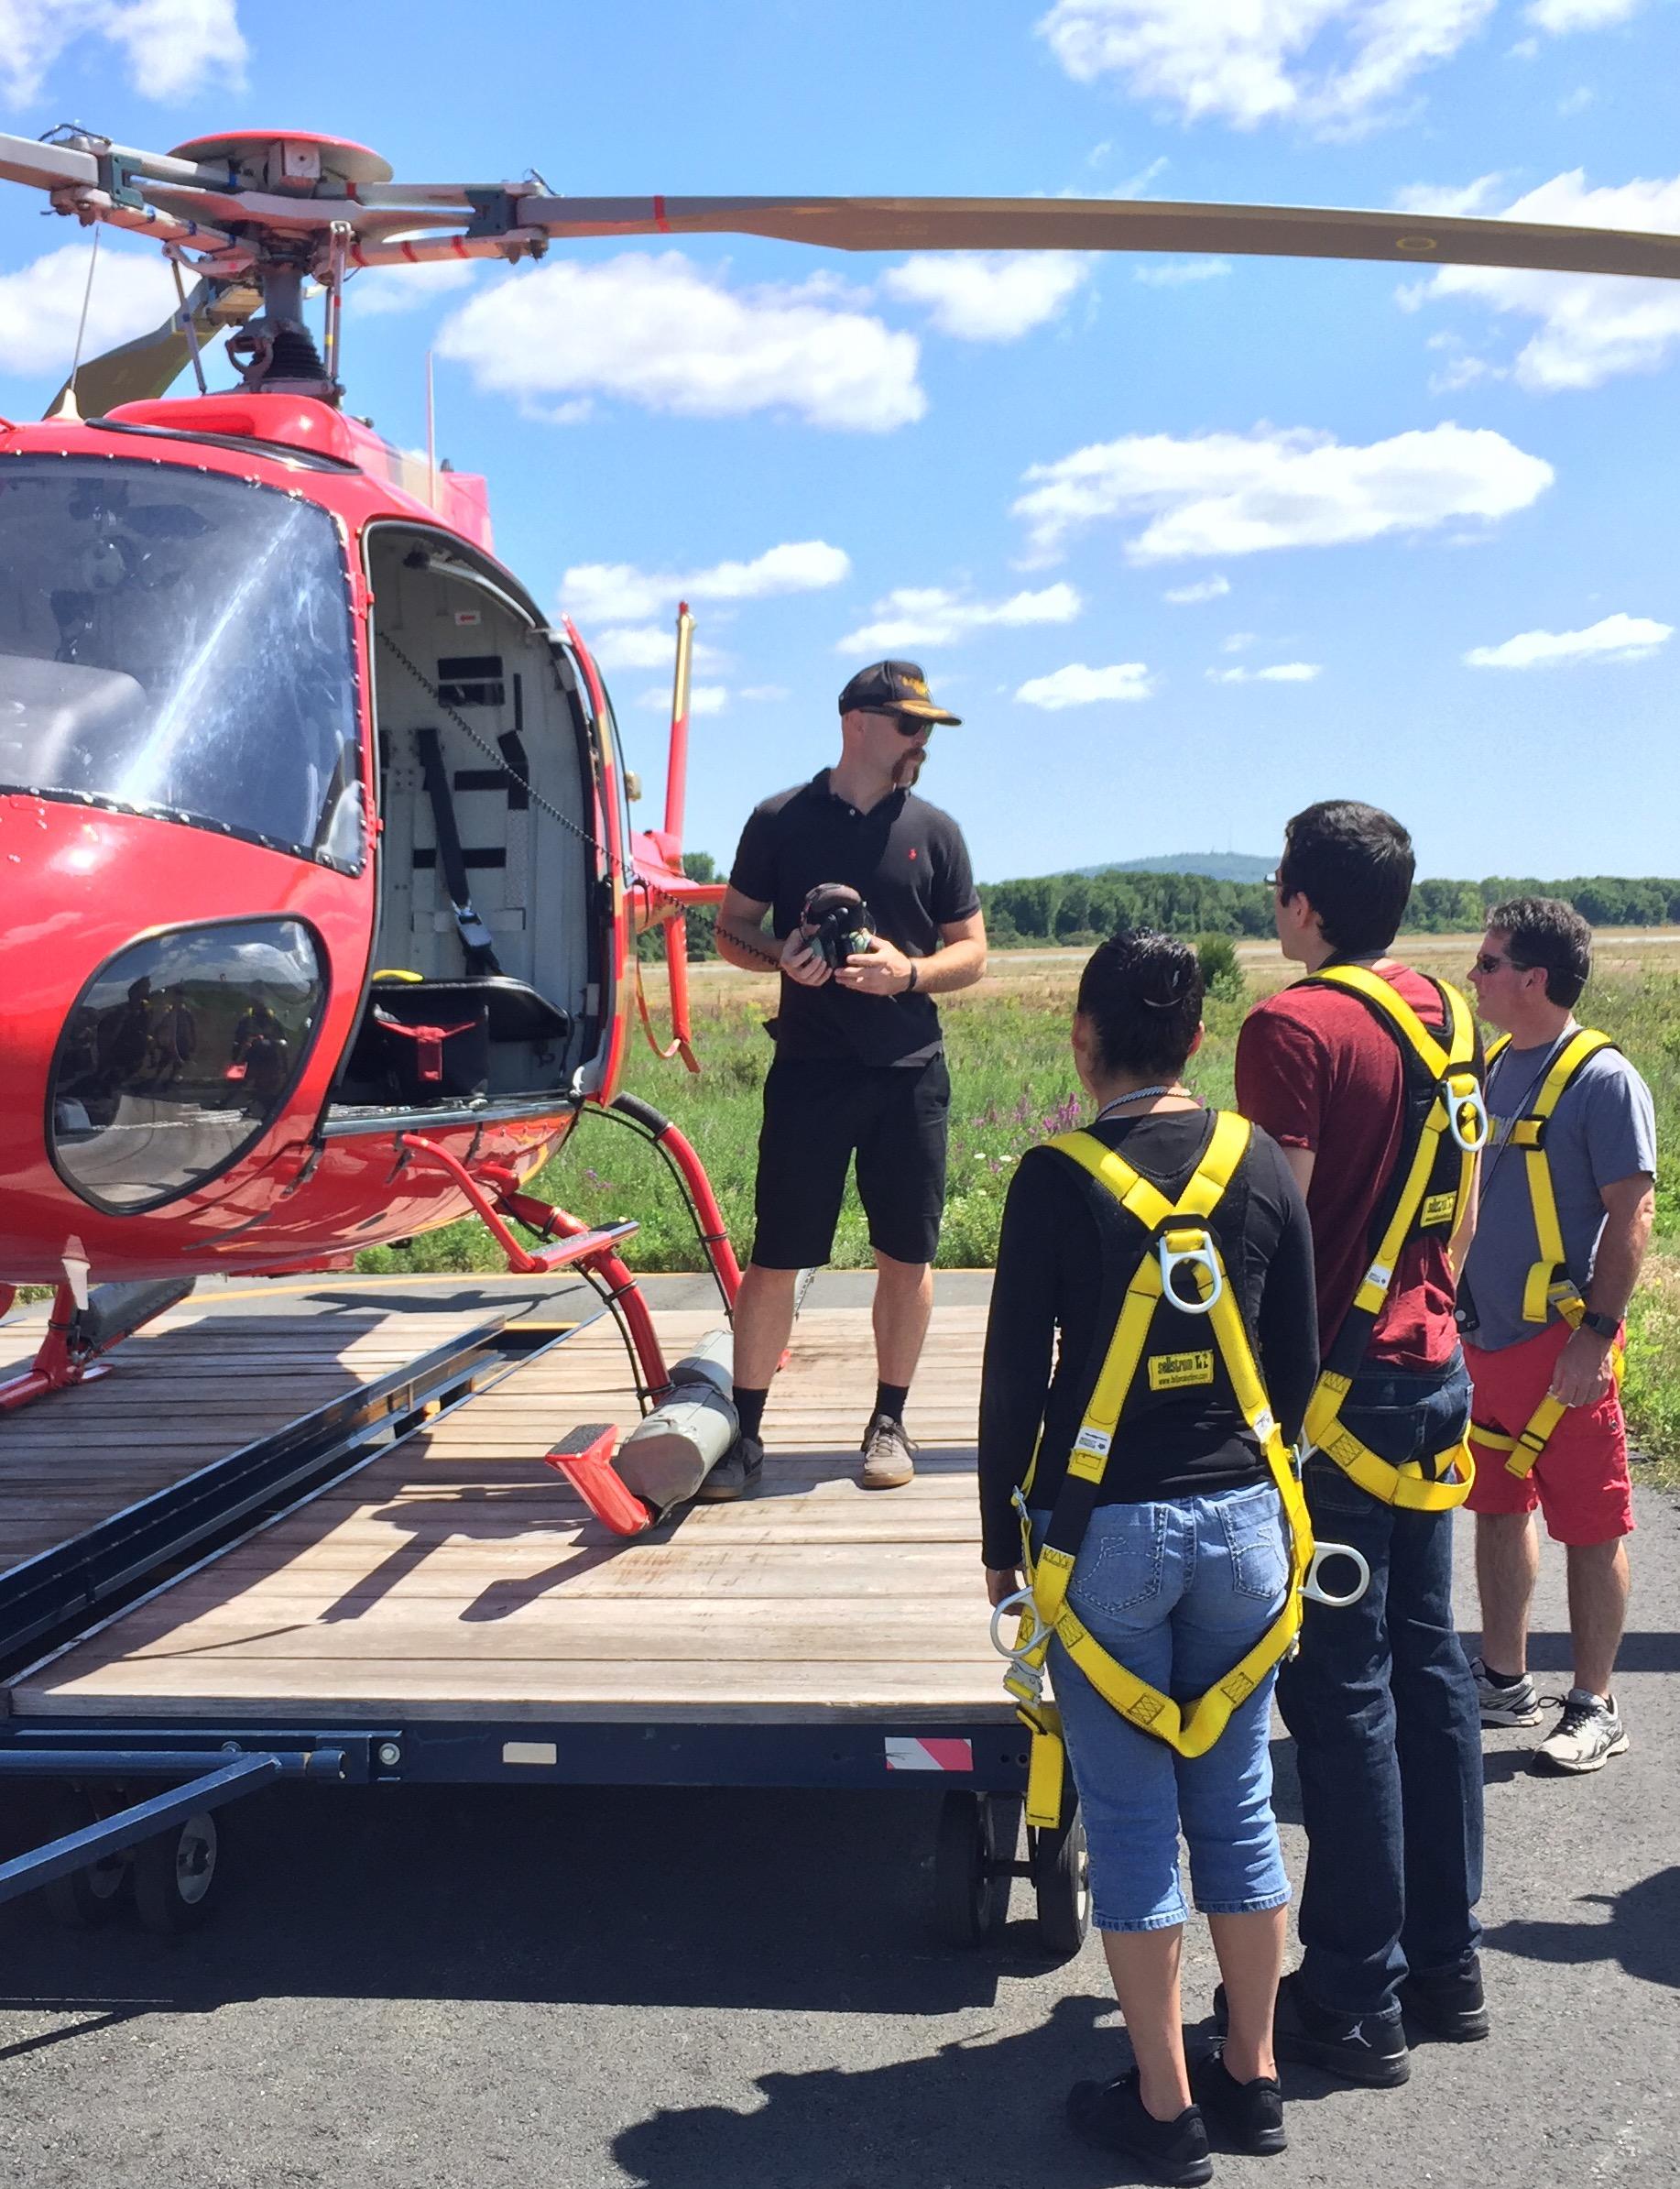 Team Building Helicopter Flights